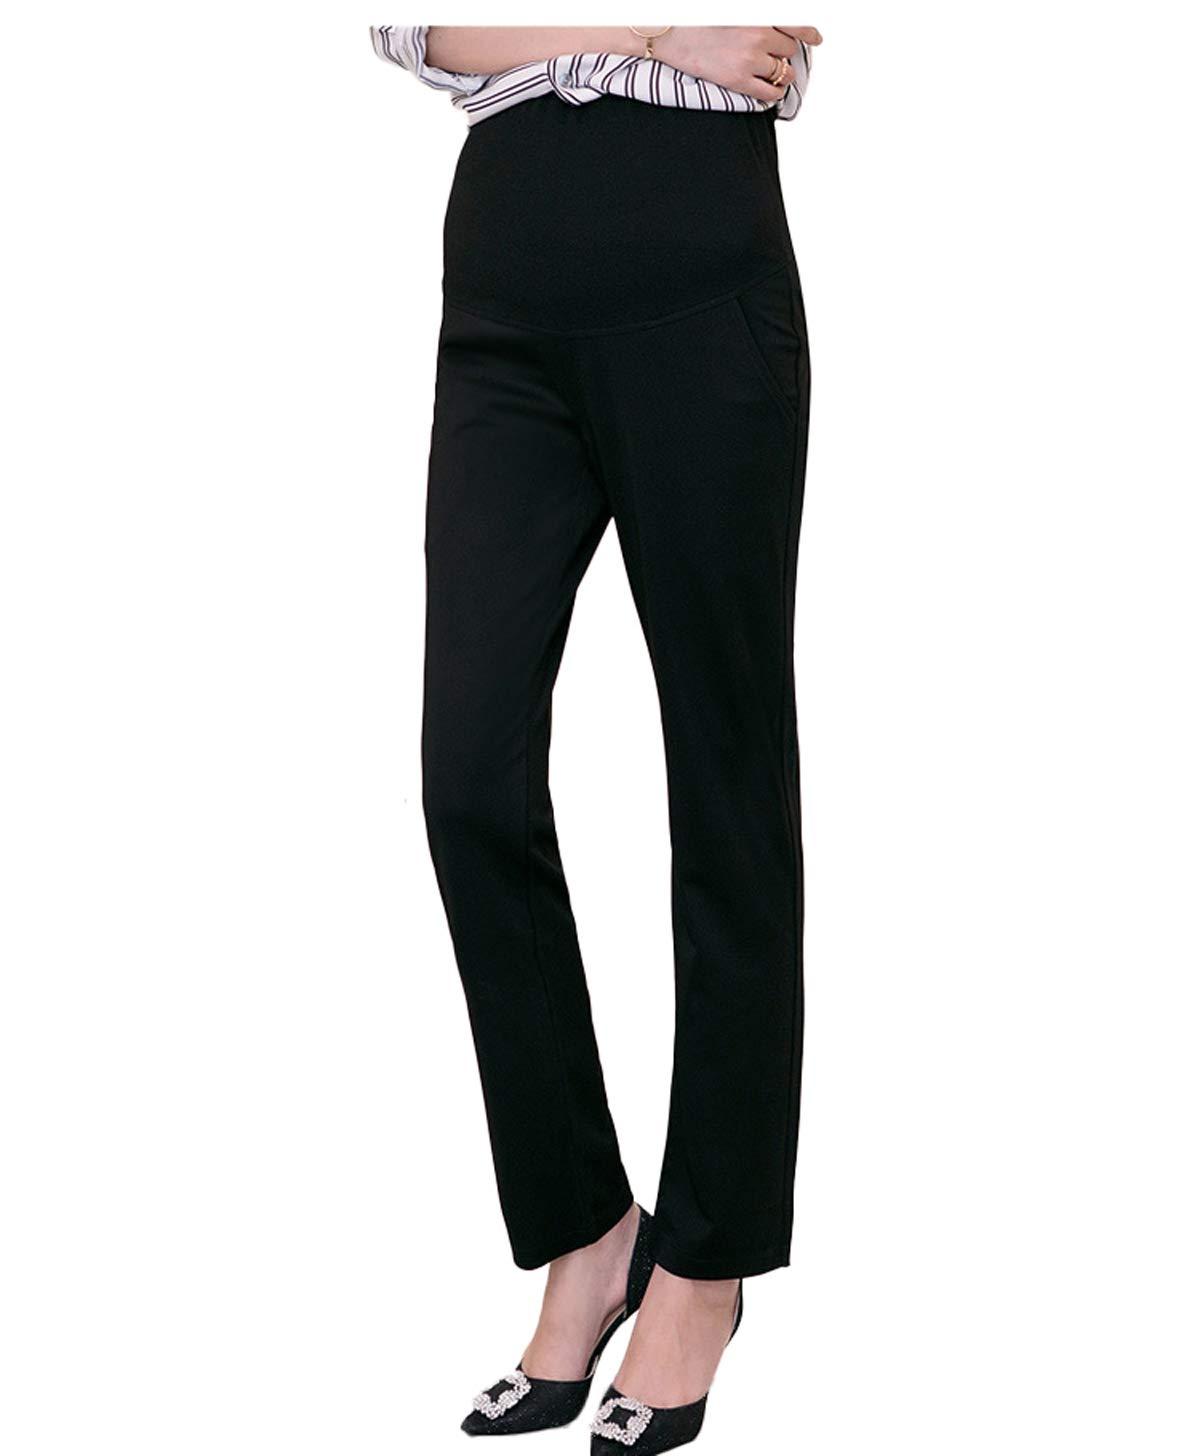 Maternity Pants Career Wear Maternity Slacks Pregnancy Trousers (XX-Large, Black) by Funfreeyer